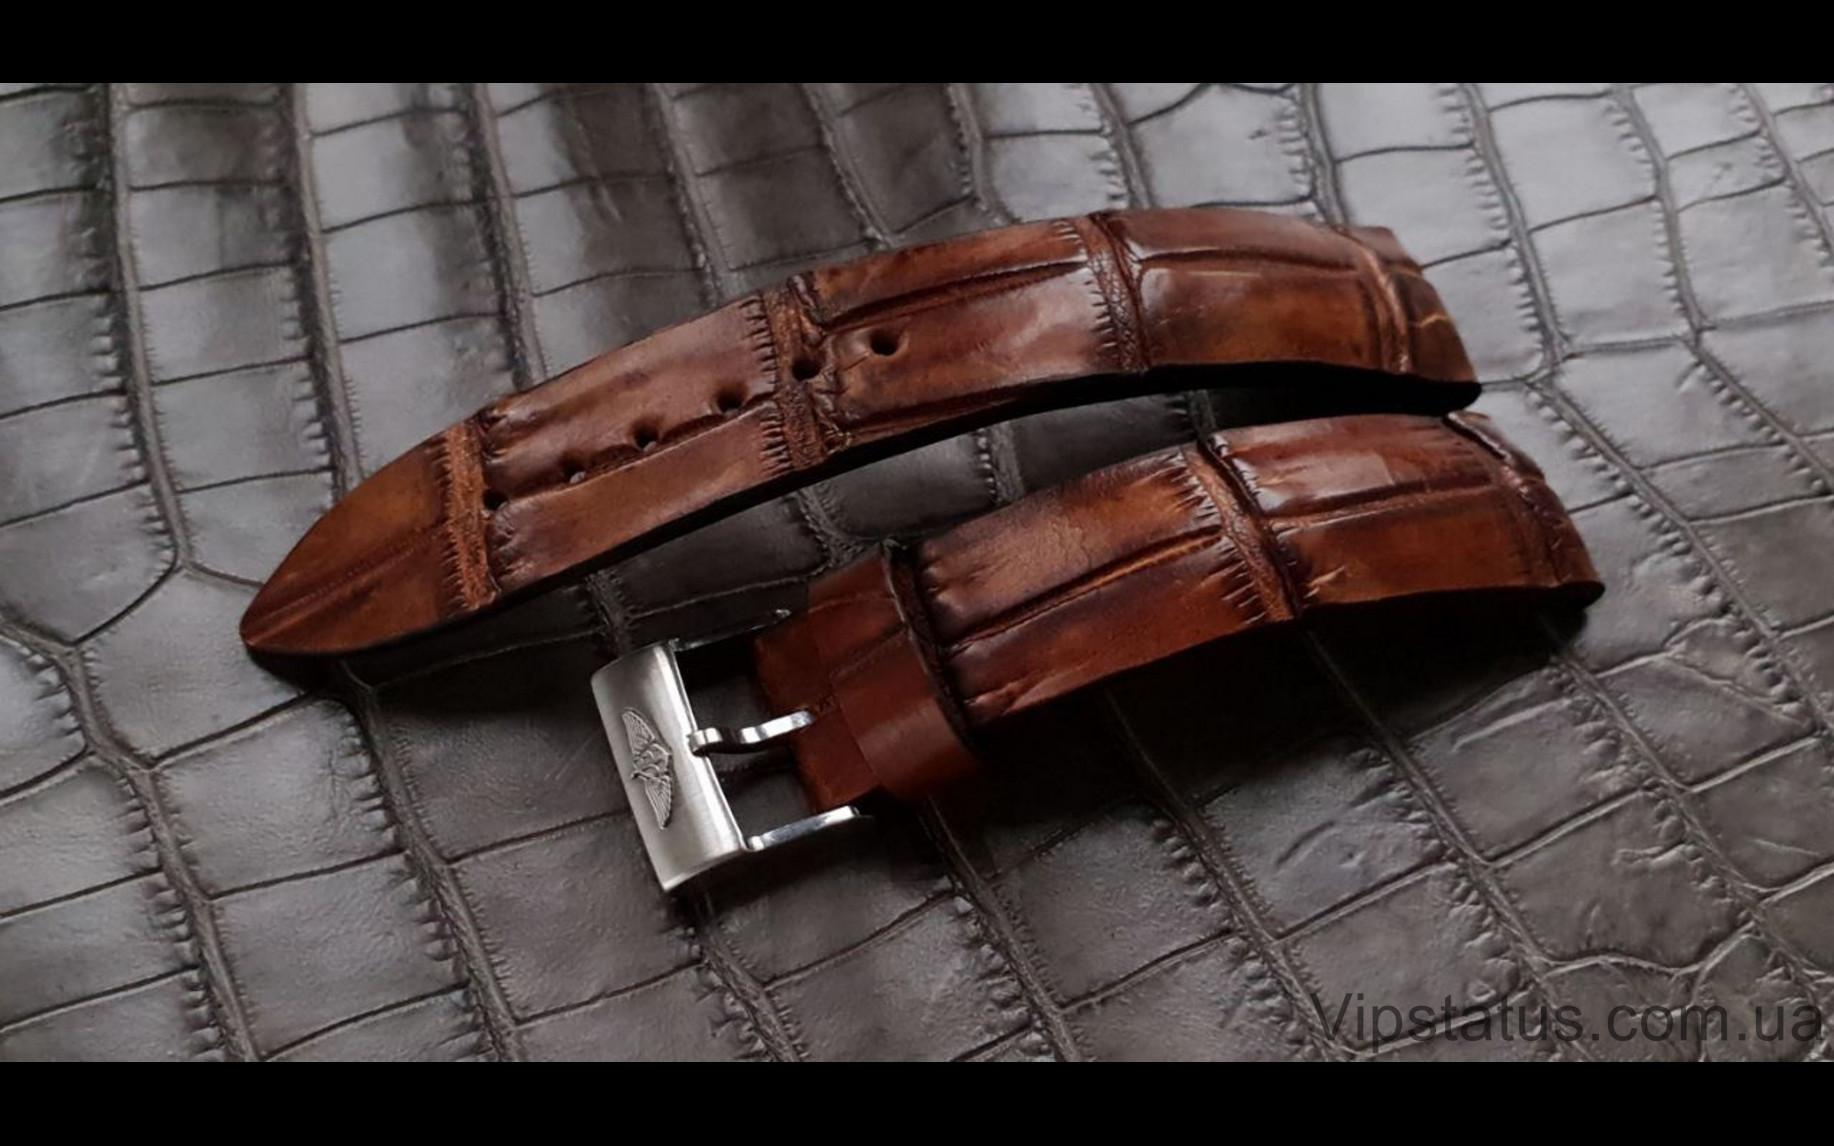 Elite Эксклюзивный ремешок для часов Raymond Weil кожа крокодила Exclusive Crocodile Strap for Raymond Weil watches image 2